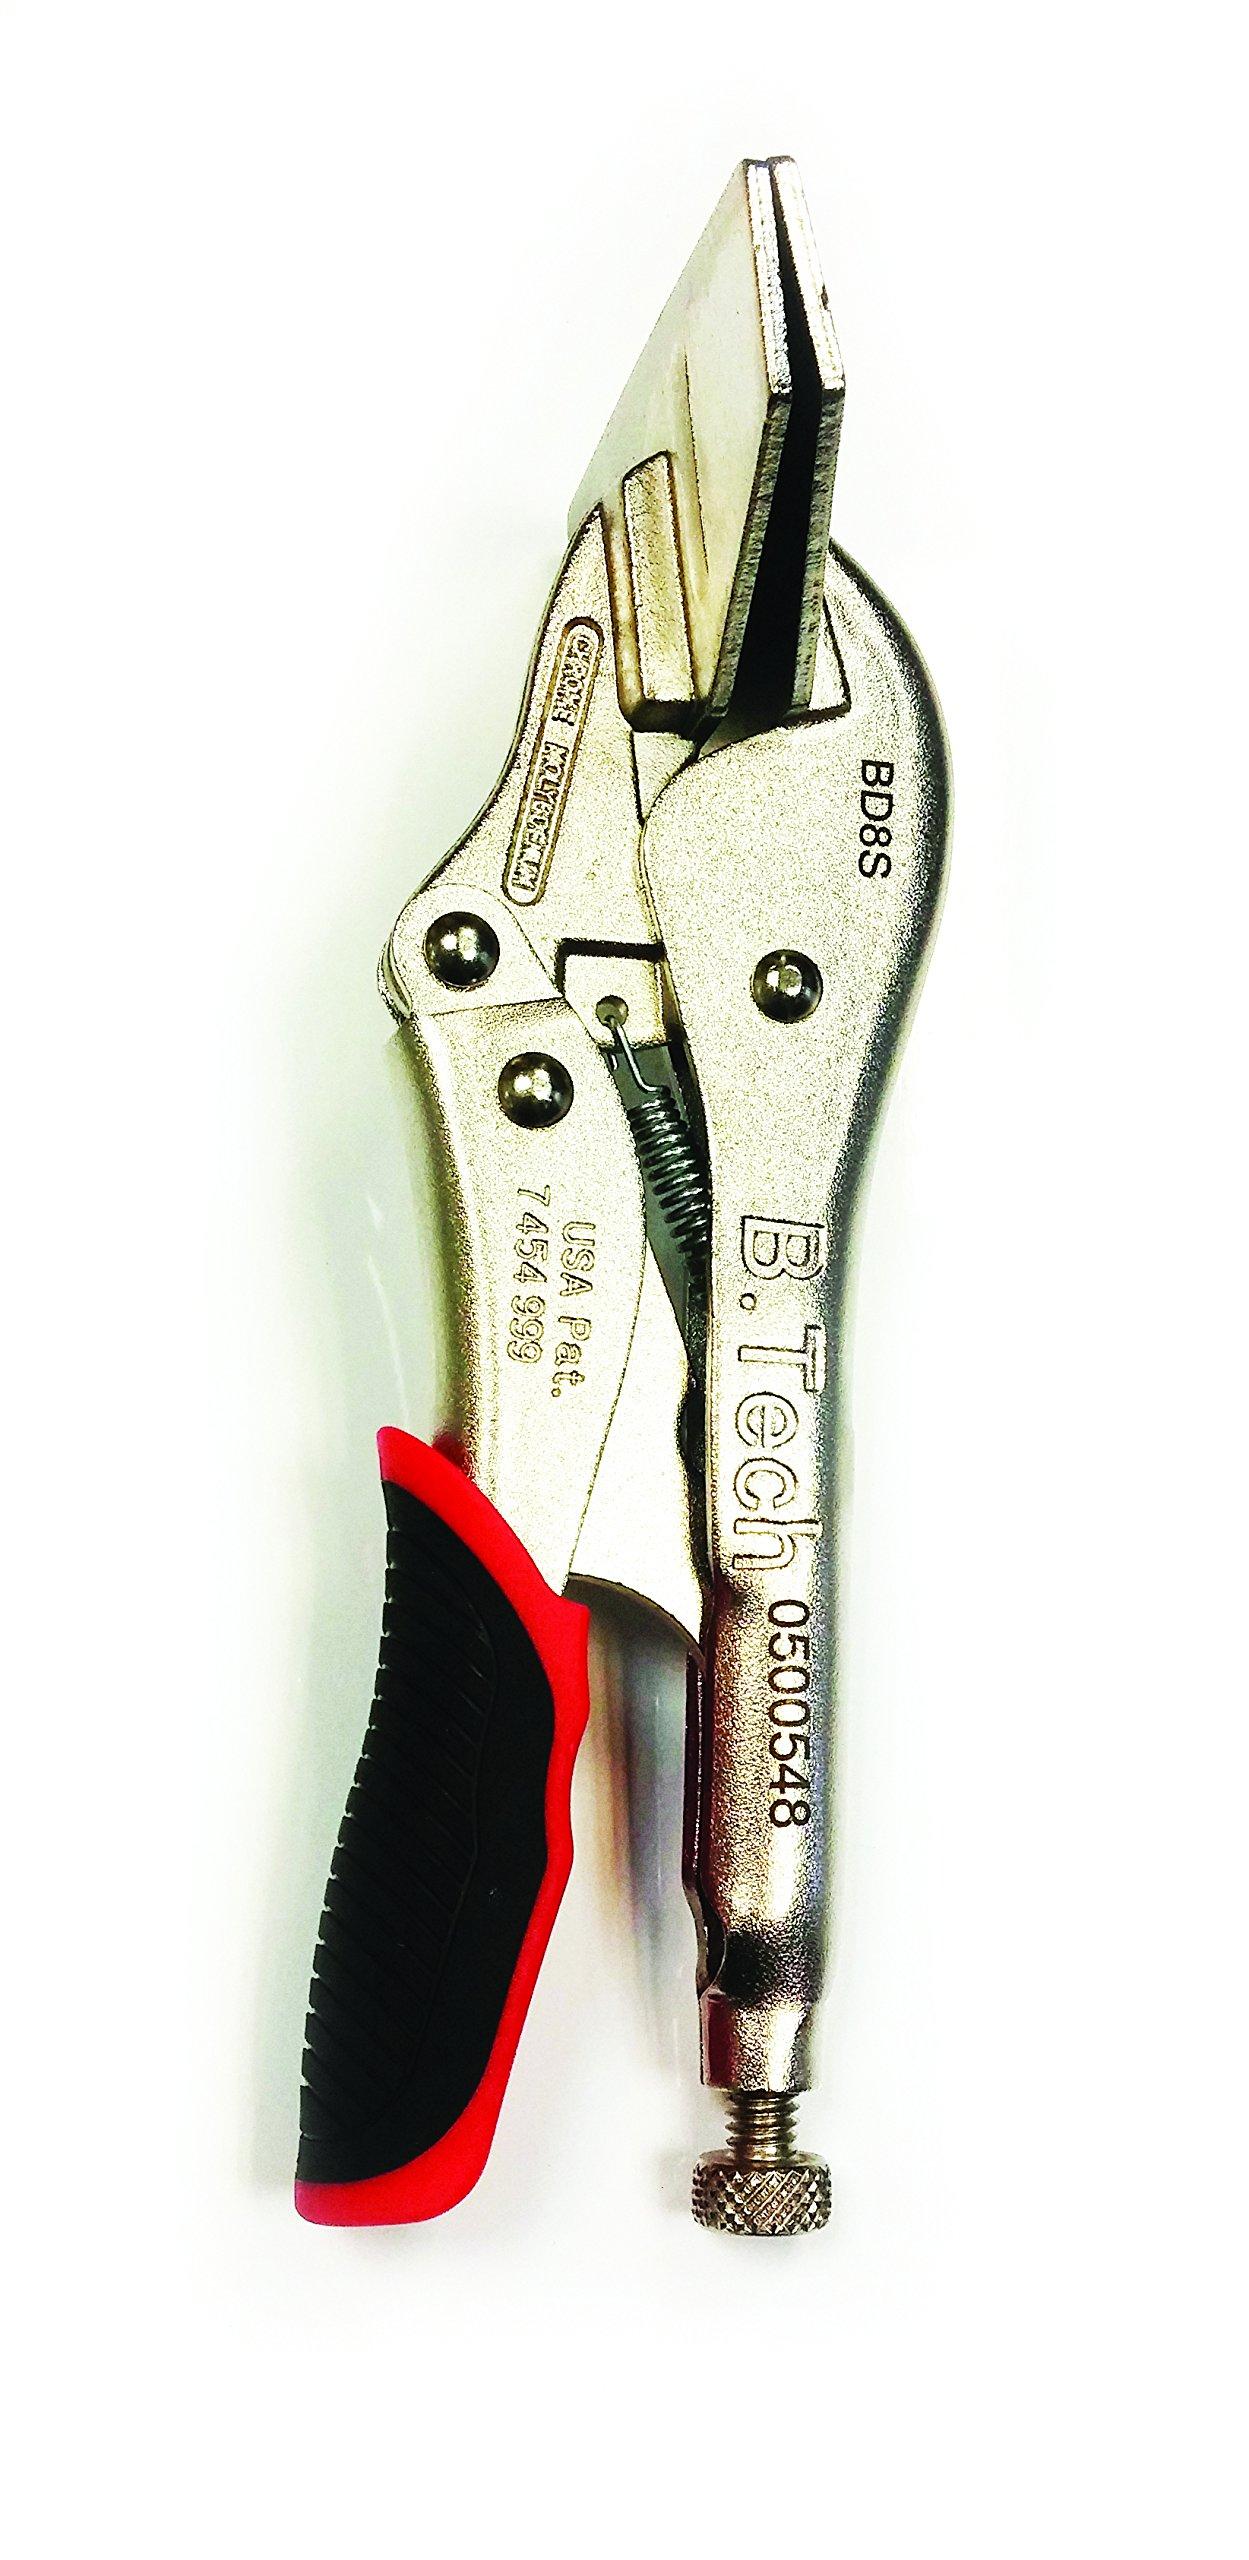 B.Tech 8'' adjustable quick release sheet metal pliers.